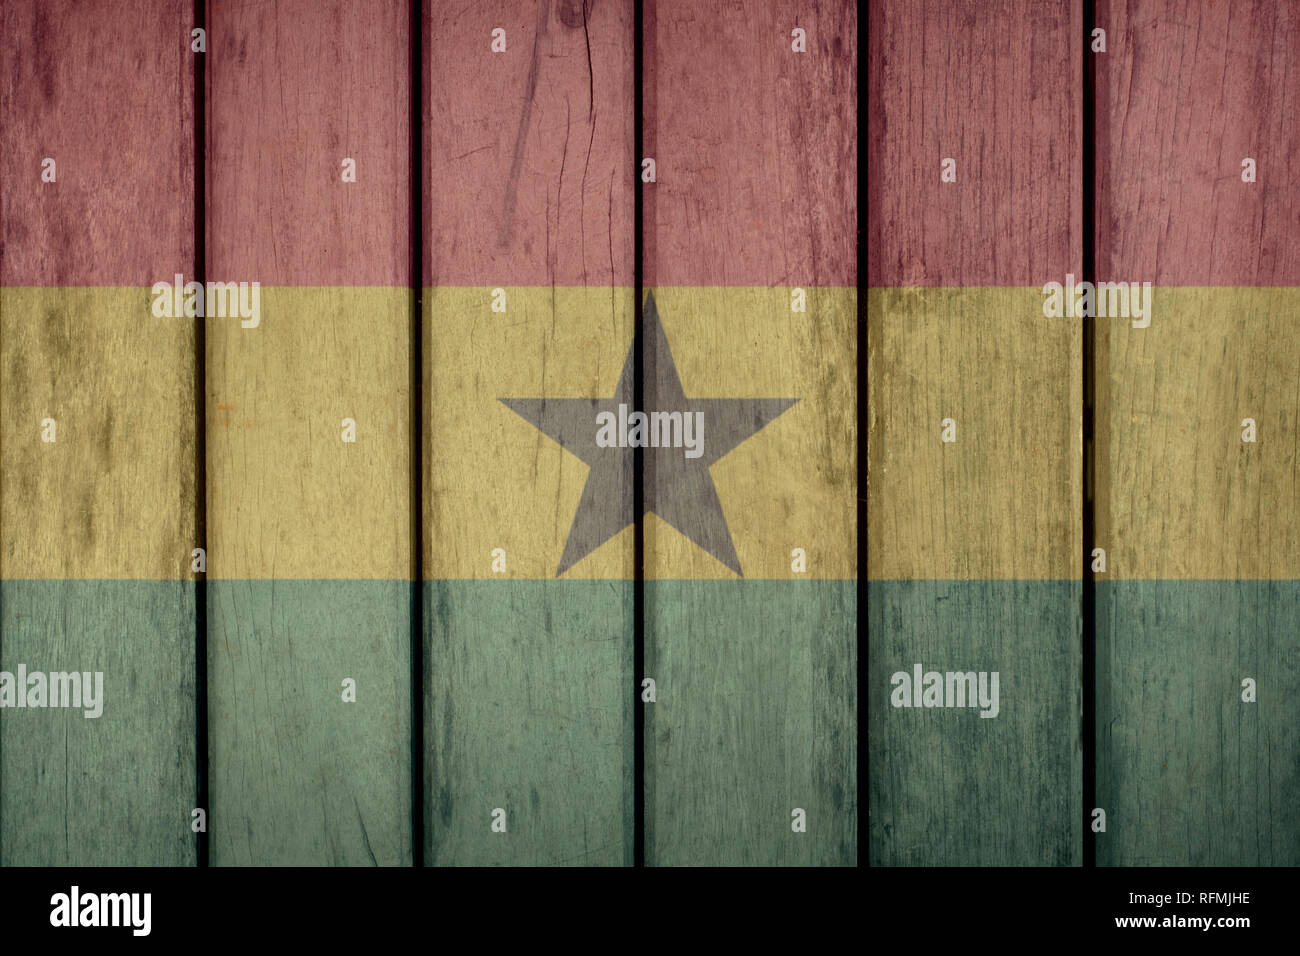 Ghana Politics News Concept: Ghanaian Flag Wooden Fence - Stock Image